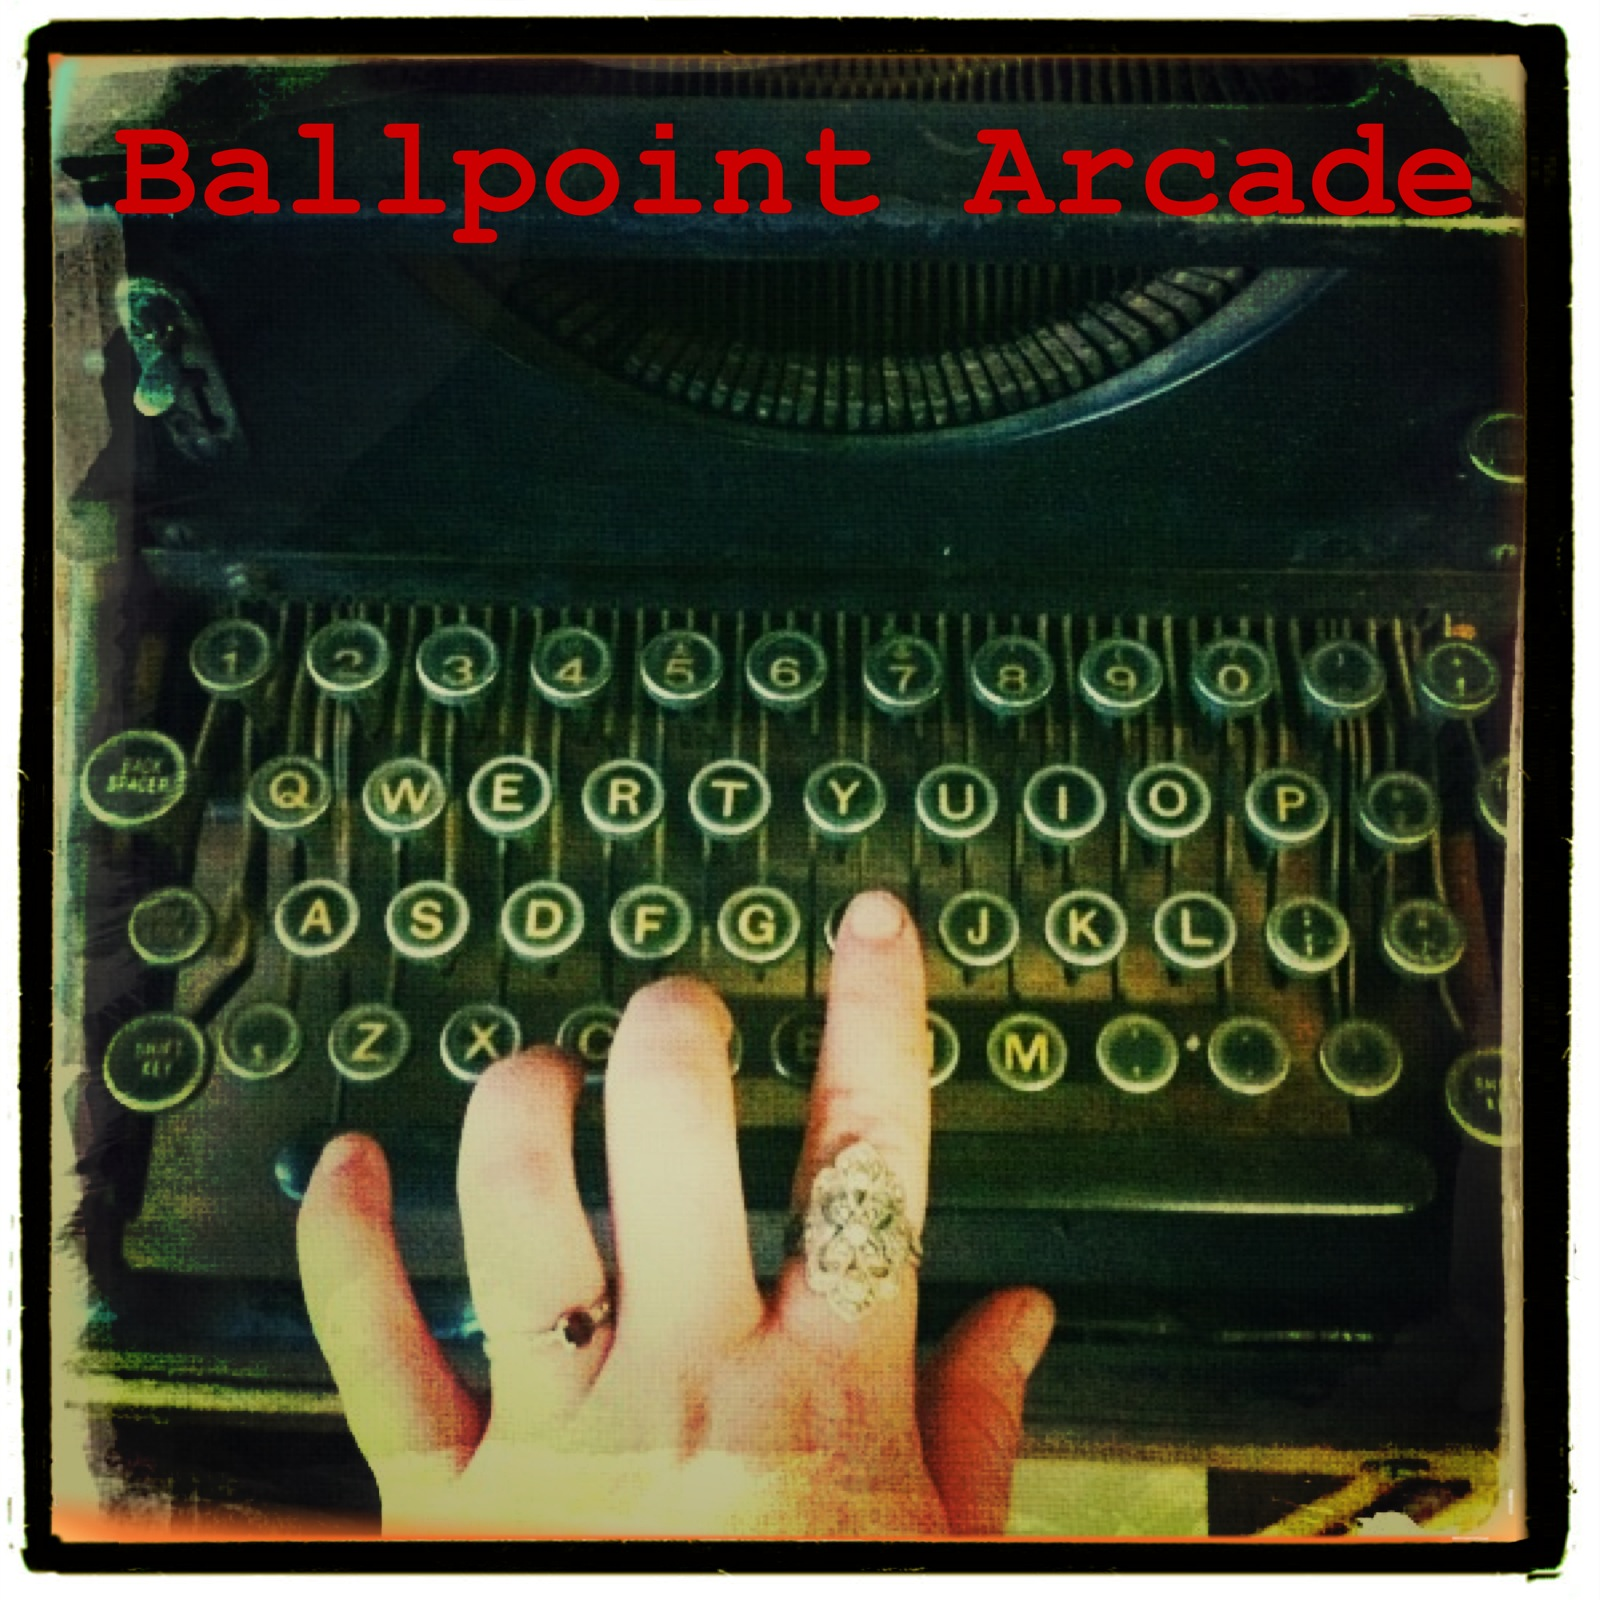 Ballpoint Arcade